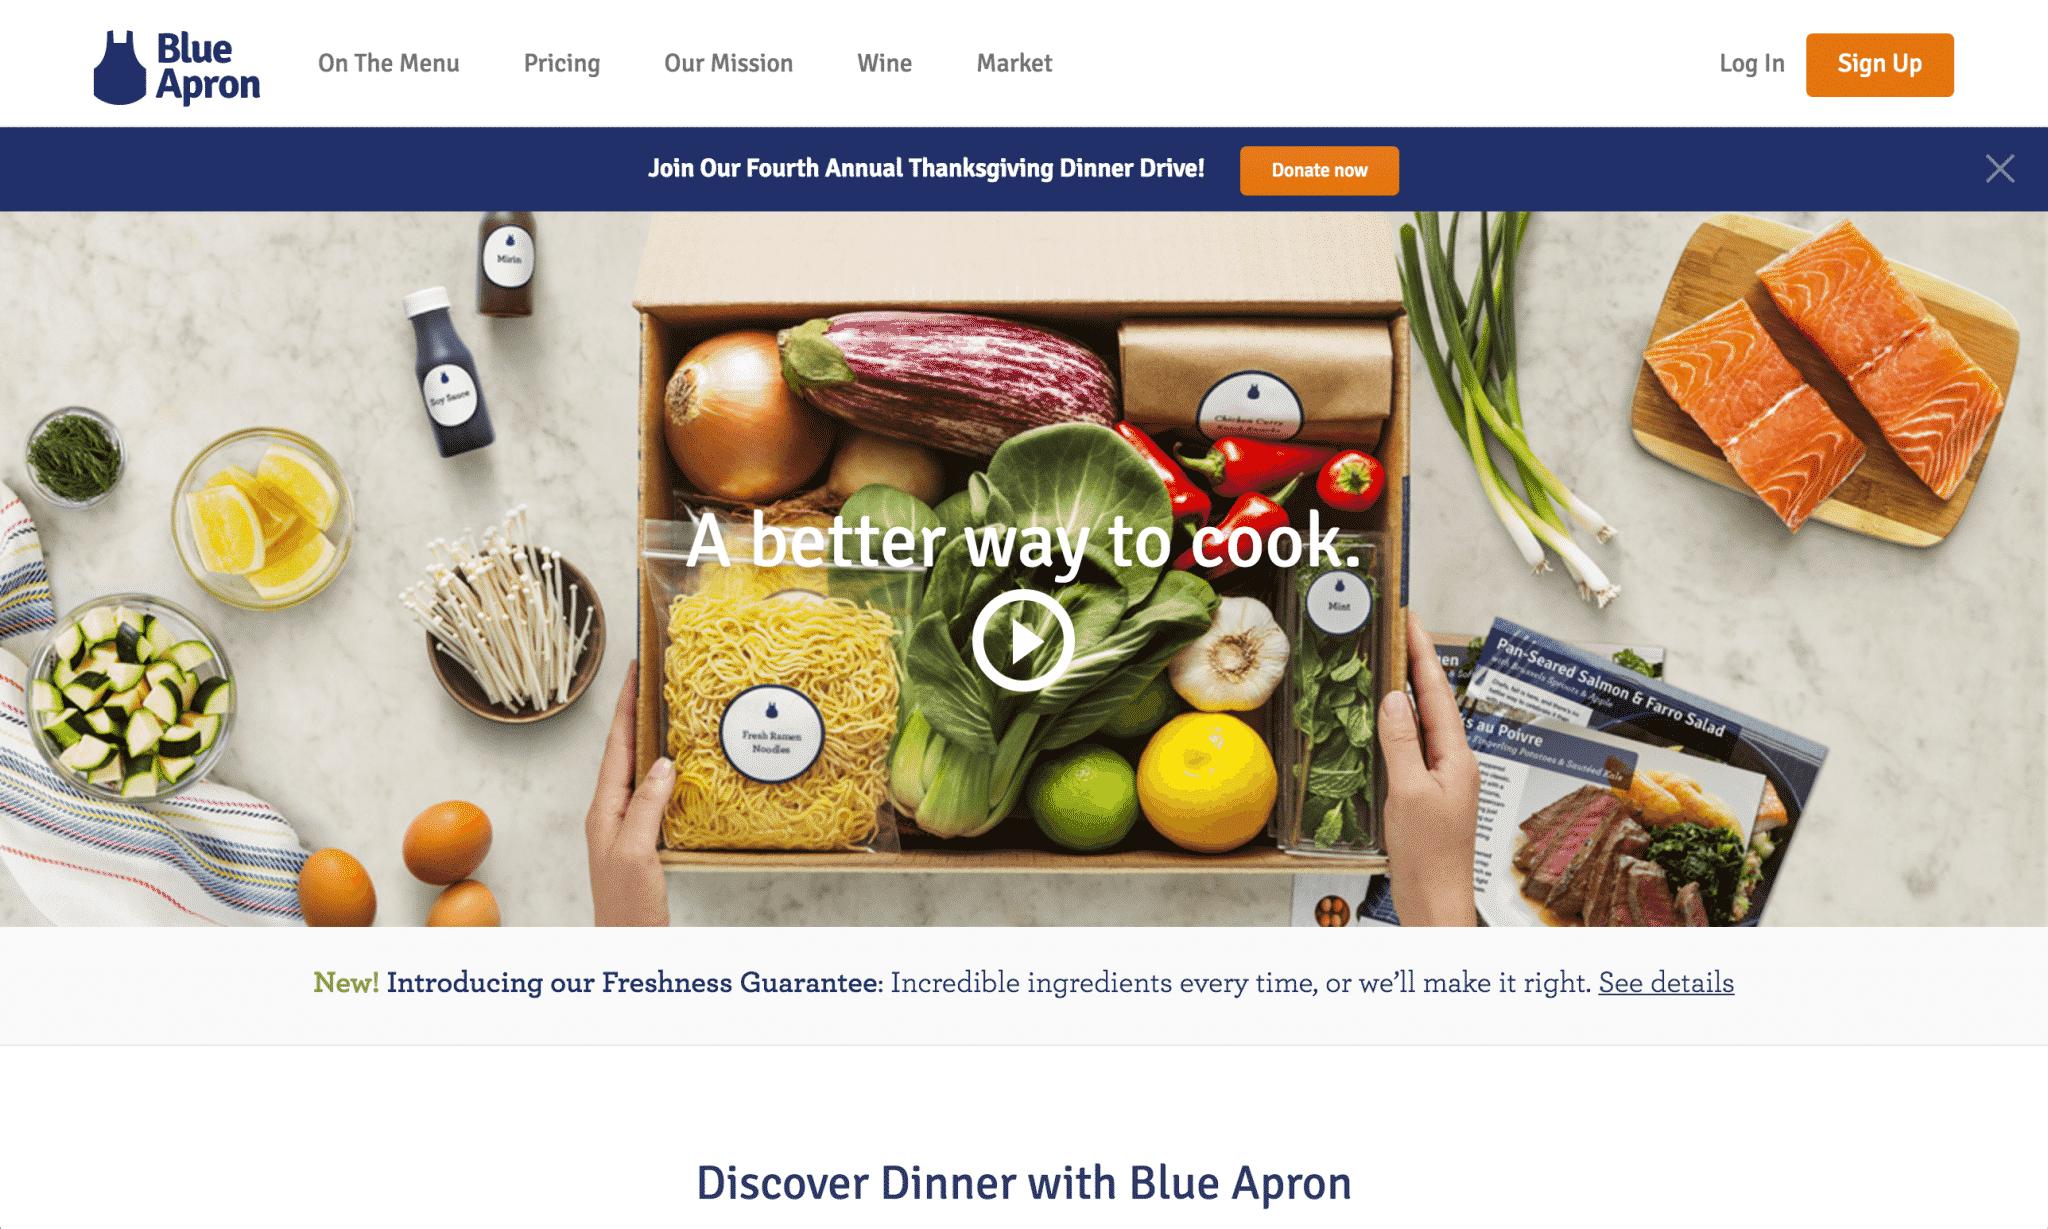 Blue Apron Landing Page Video | Disruptive Advertising